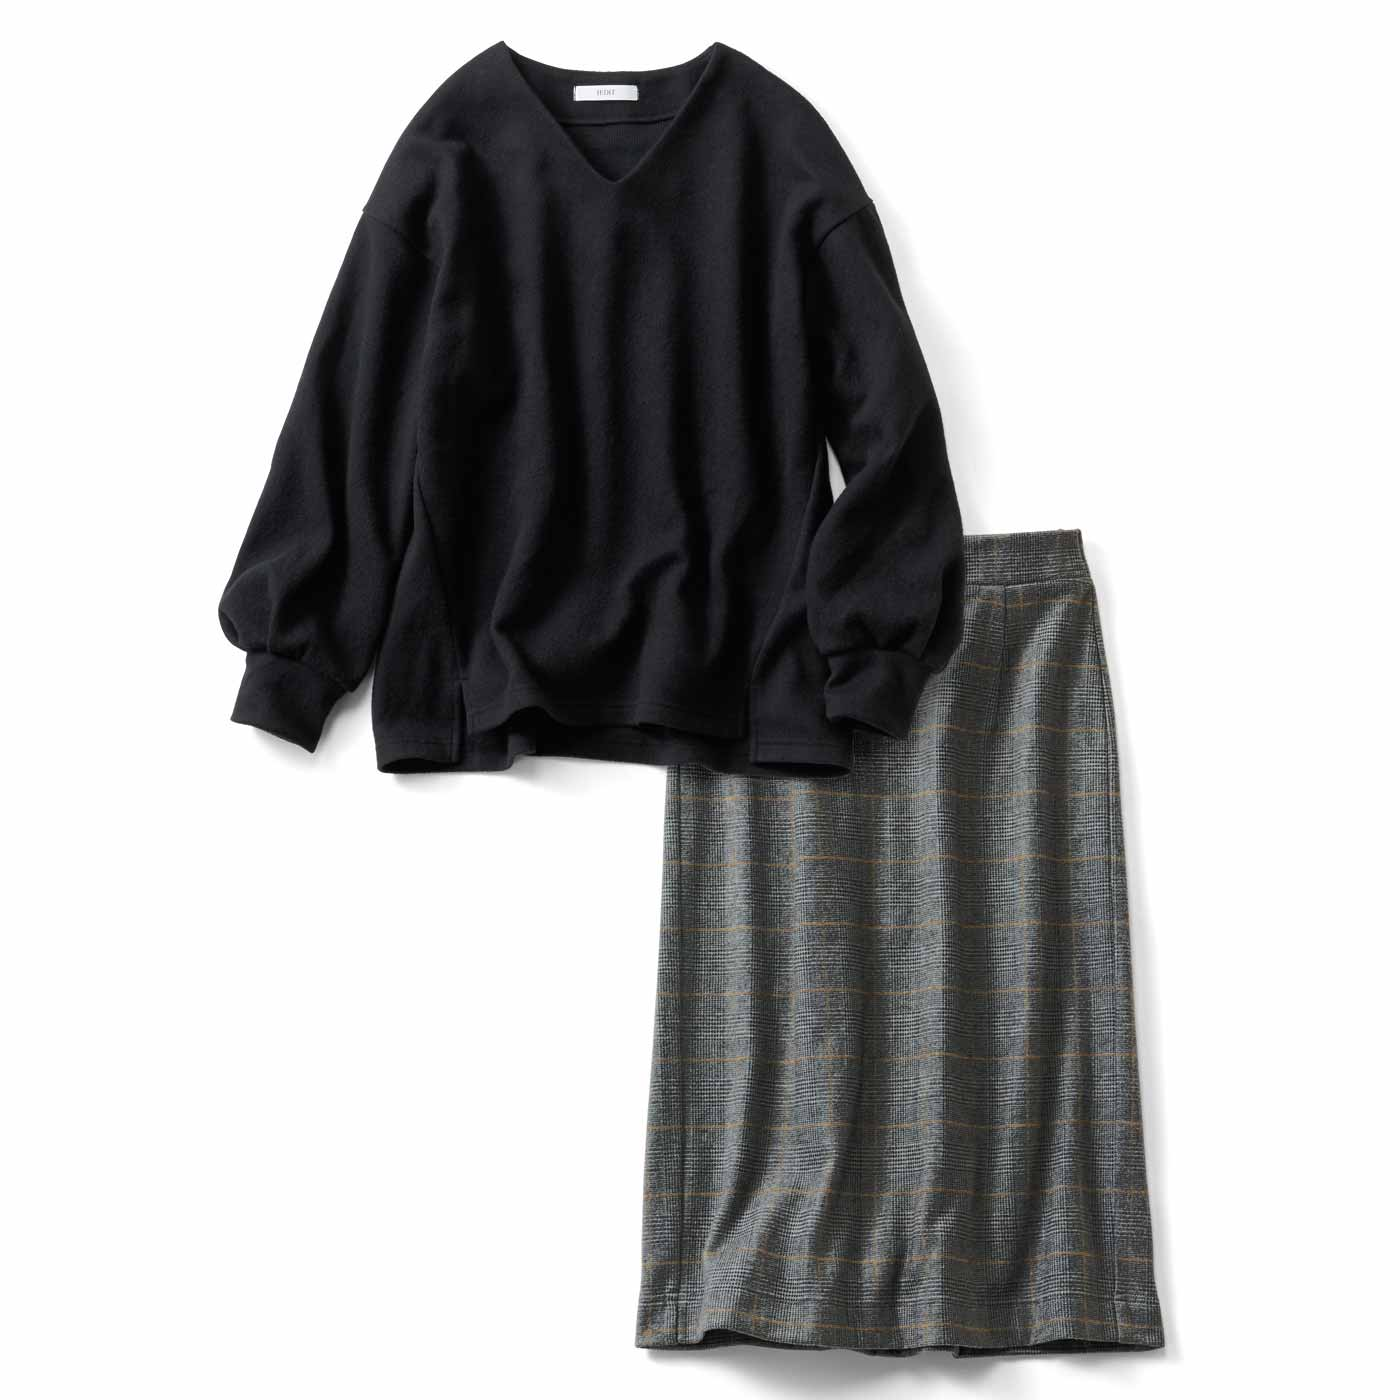 IEDIT[イディット] 暖か着映えコーデが完成する 起毛カットソーの上品セットアップ〈ブラック〉